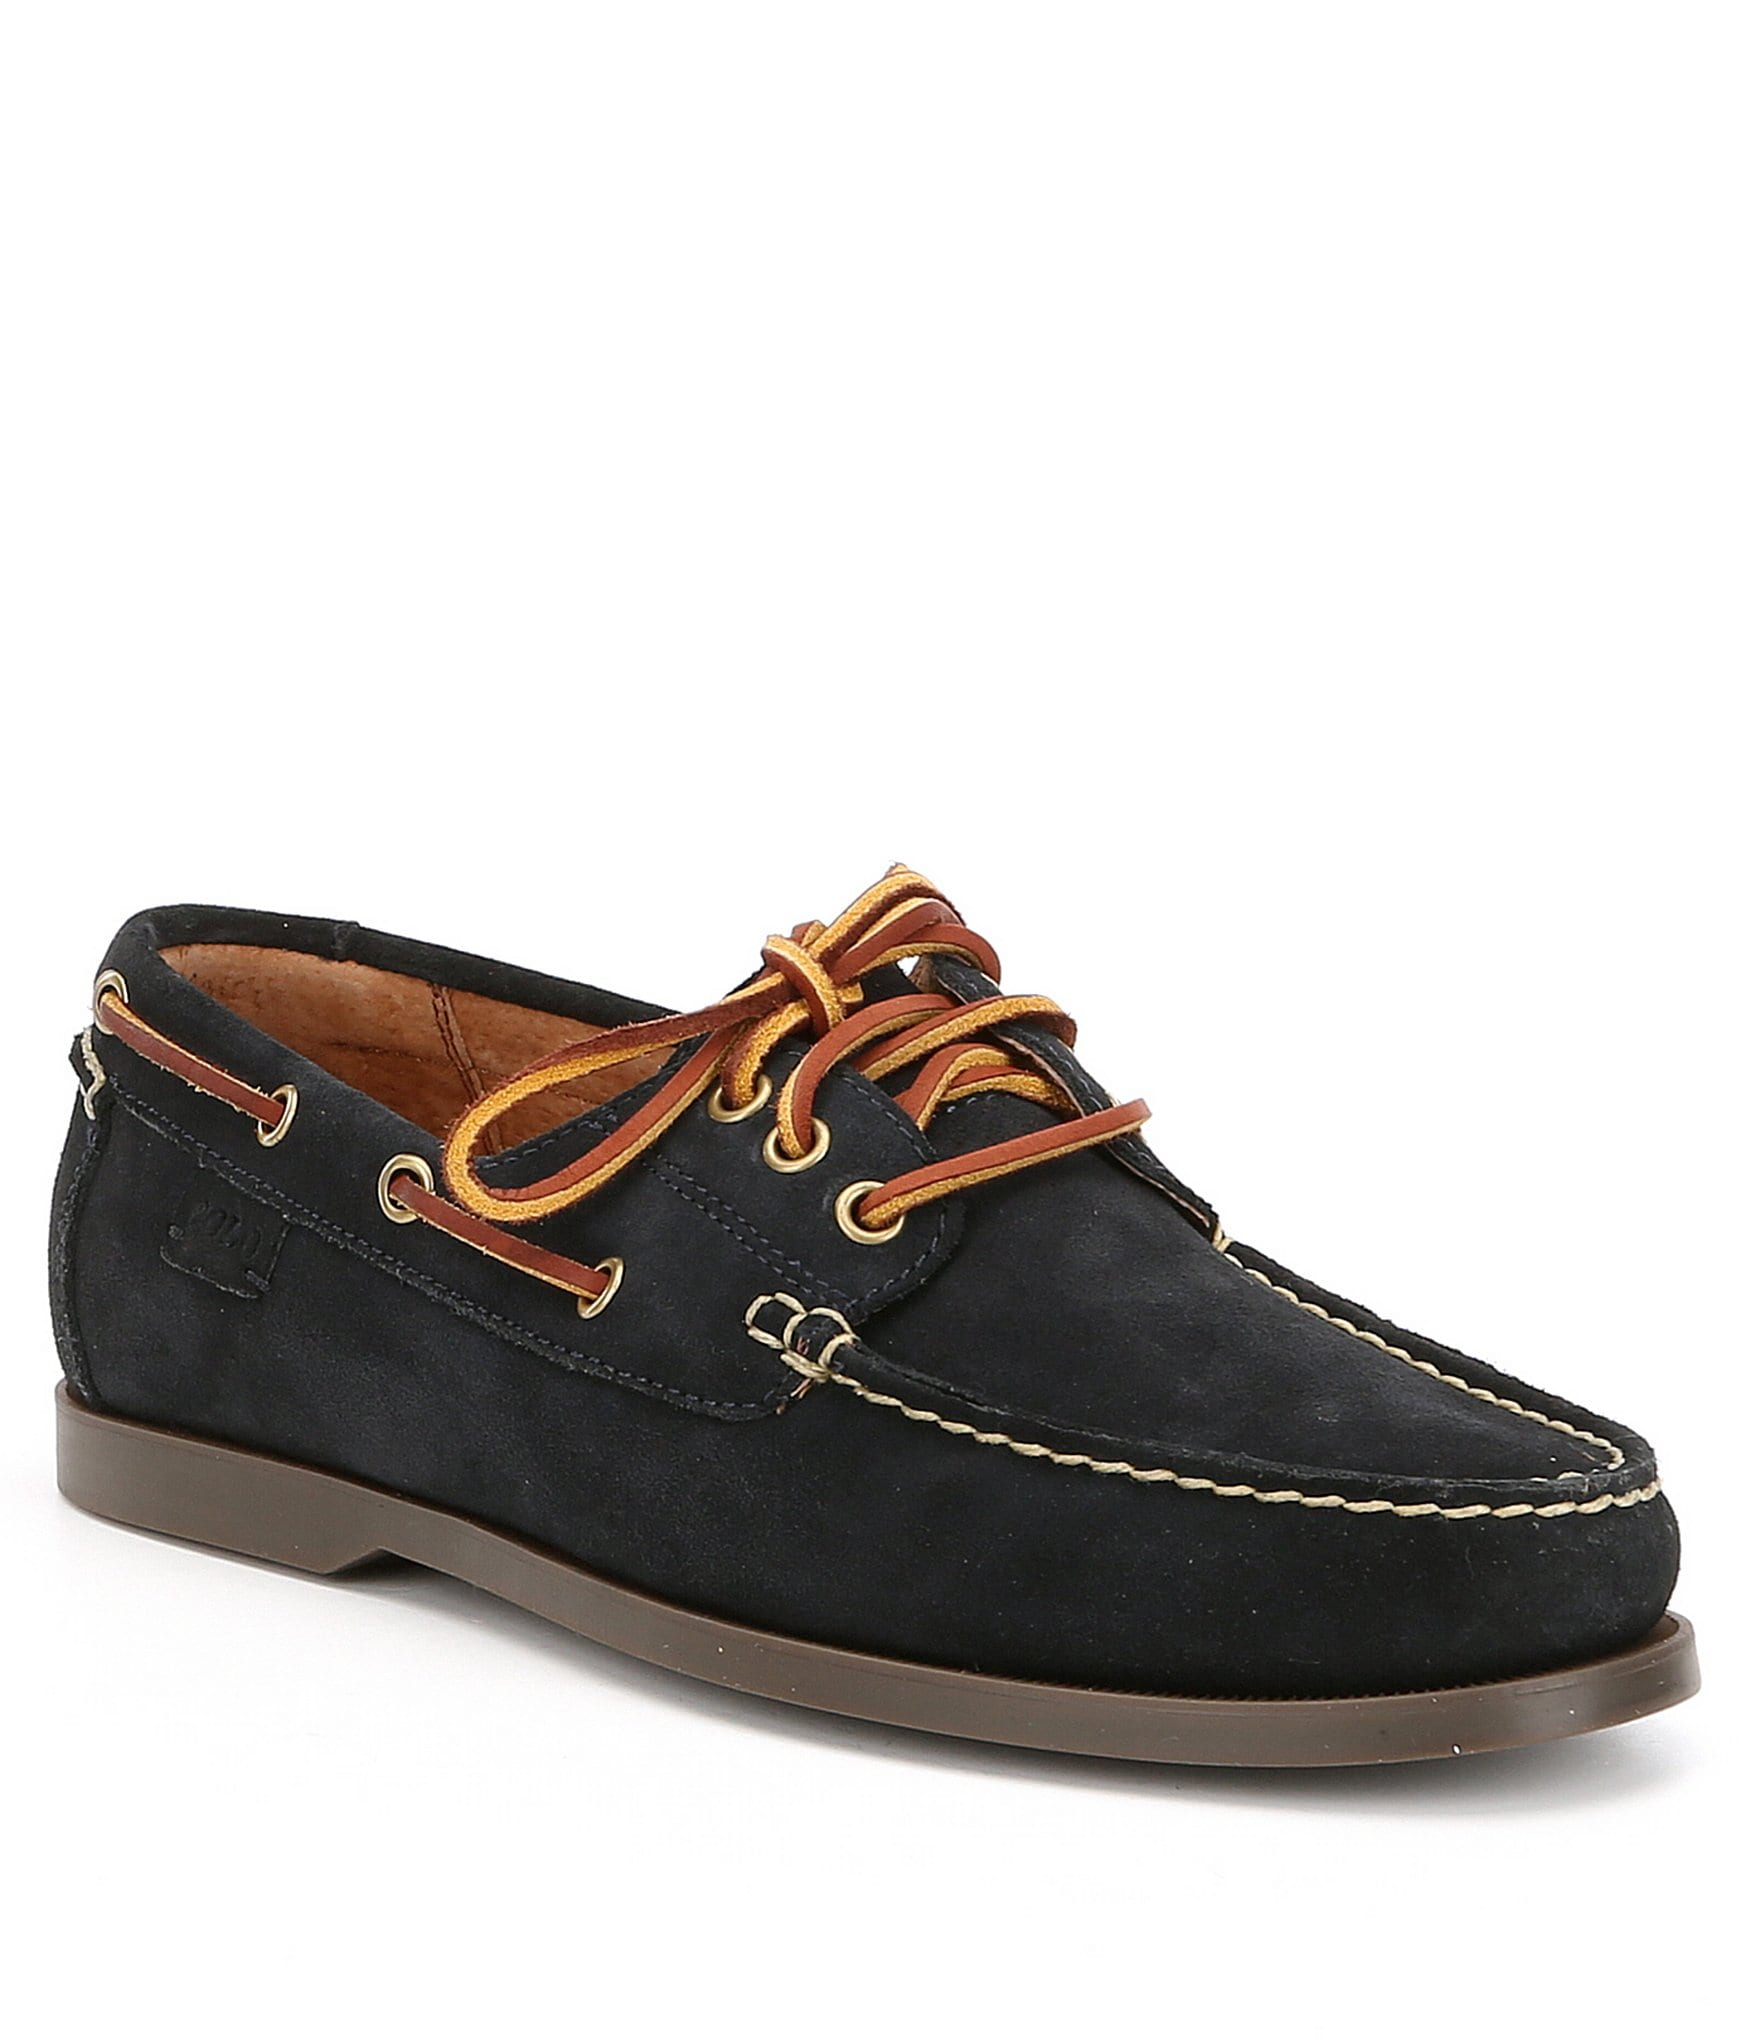 Ralph Lauren Mens Shoes Clearance